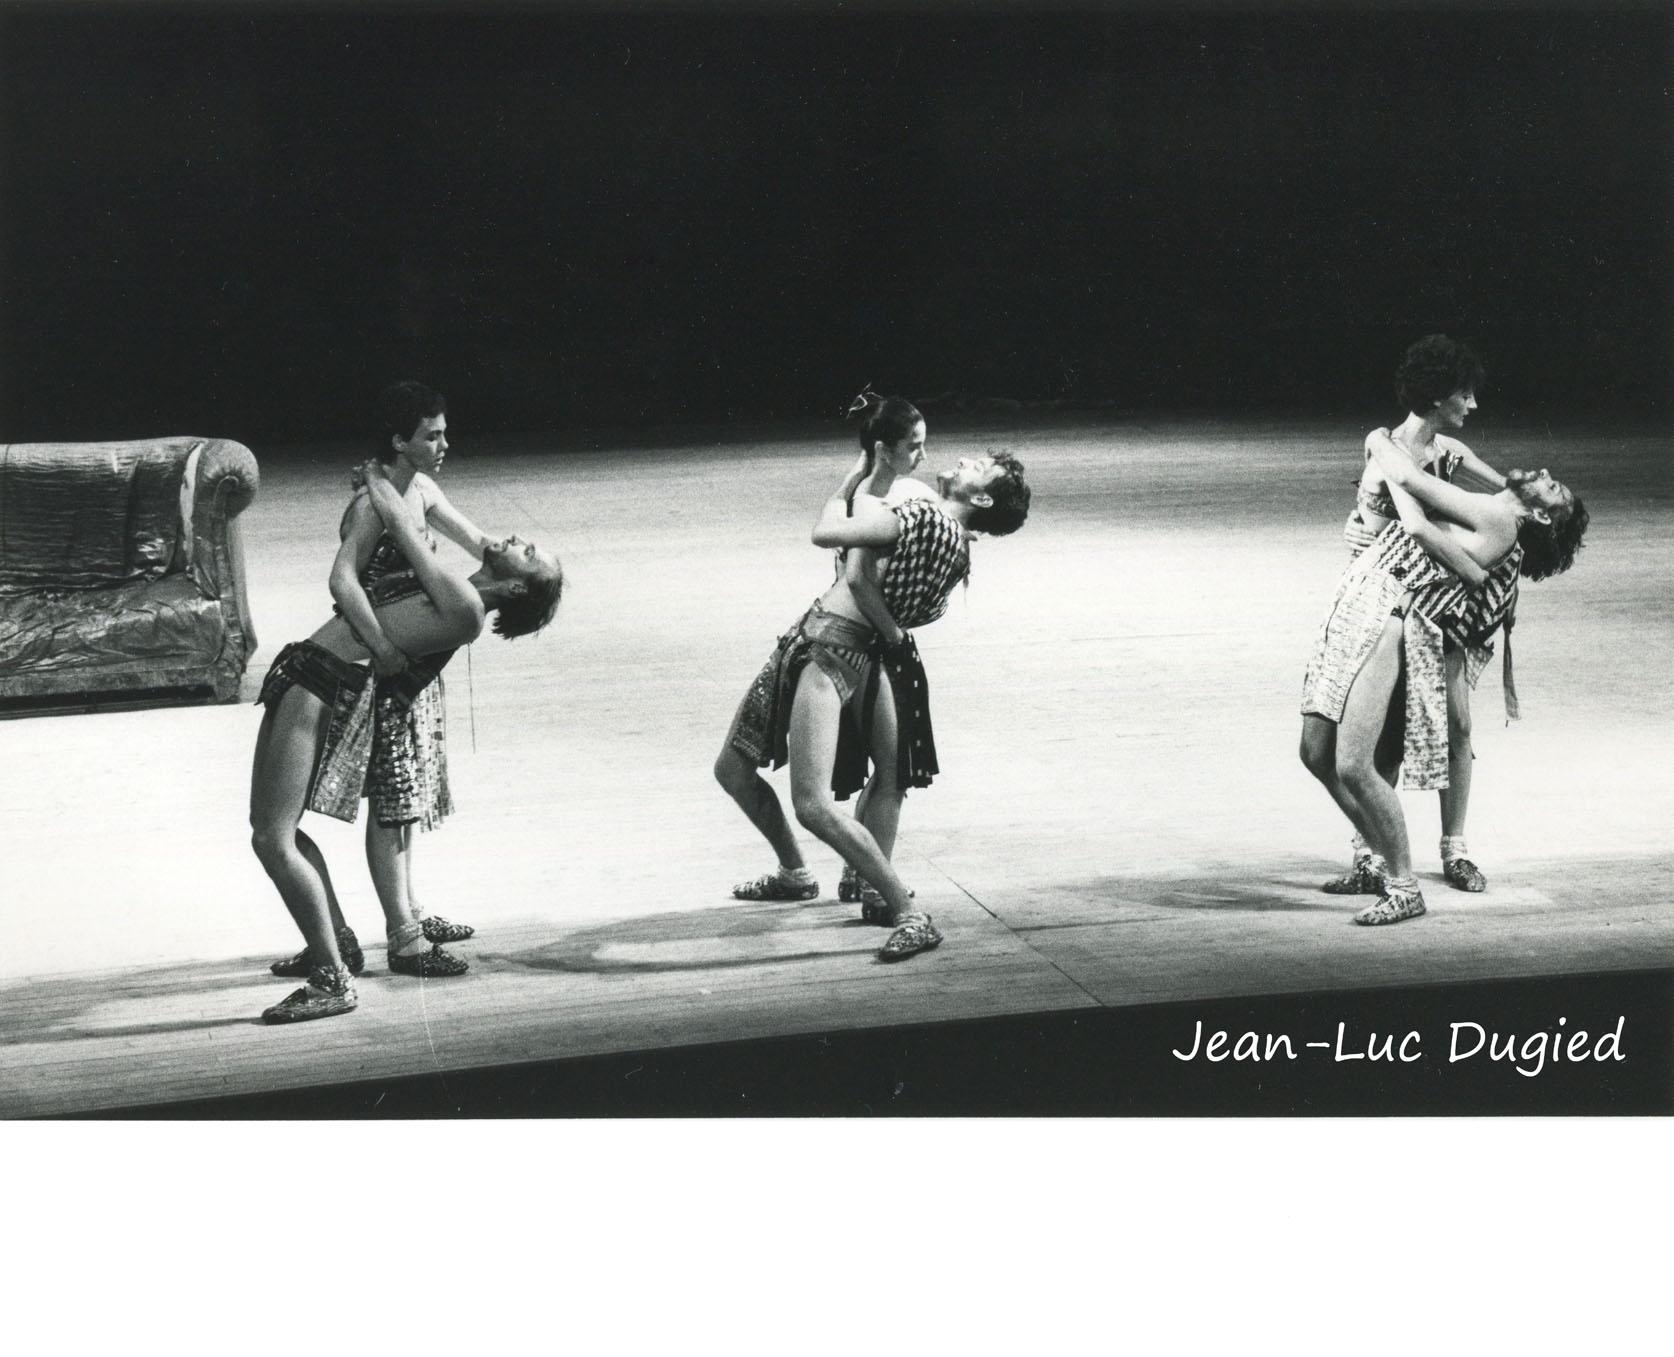 12 Gallotta Jean-Claude - les aventures d'Ivan Vaffan - 1984